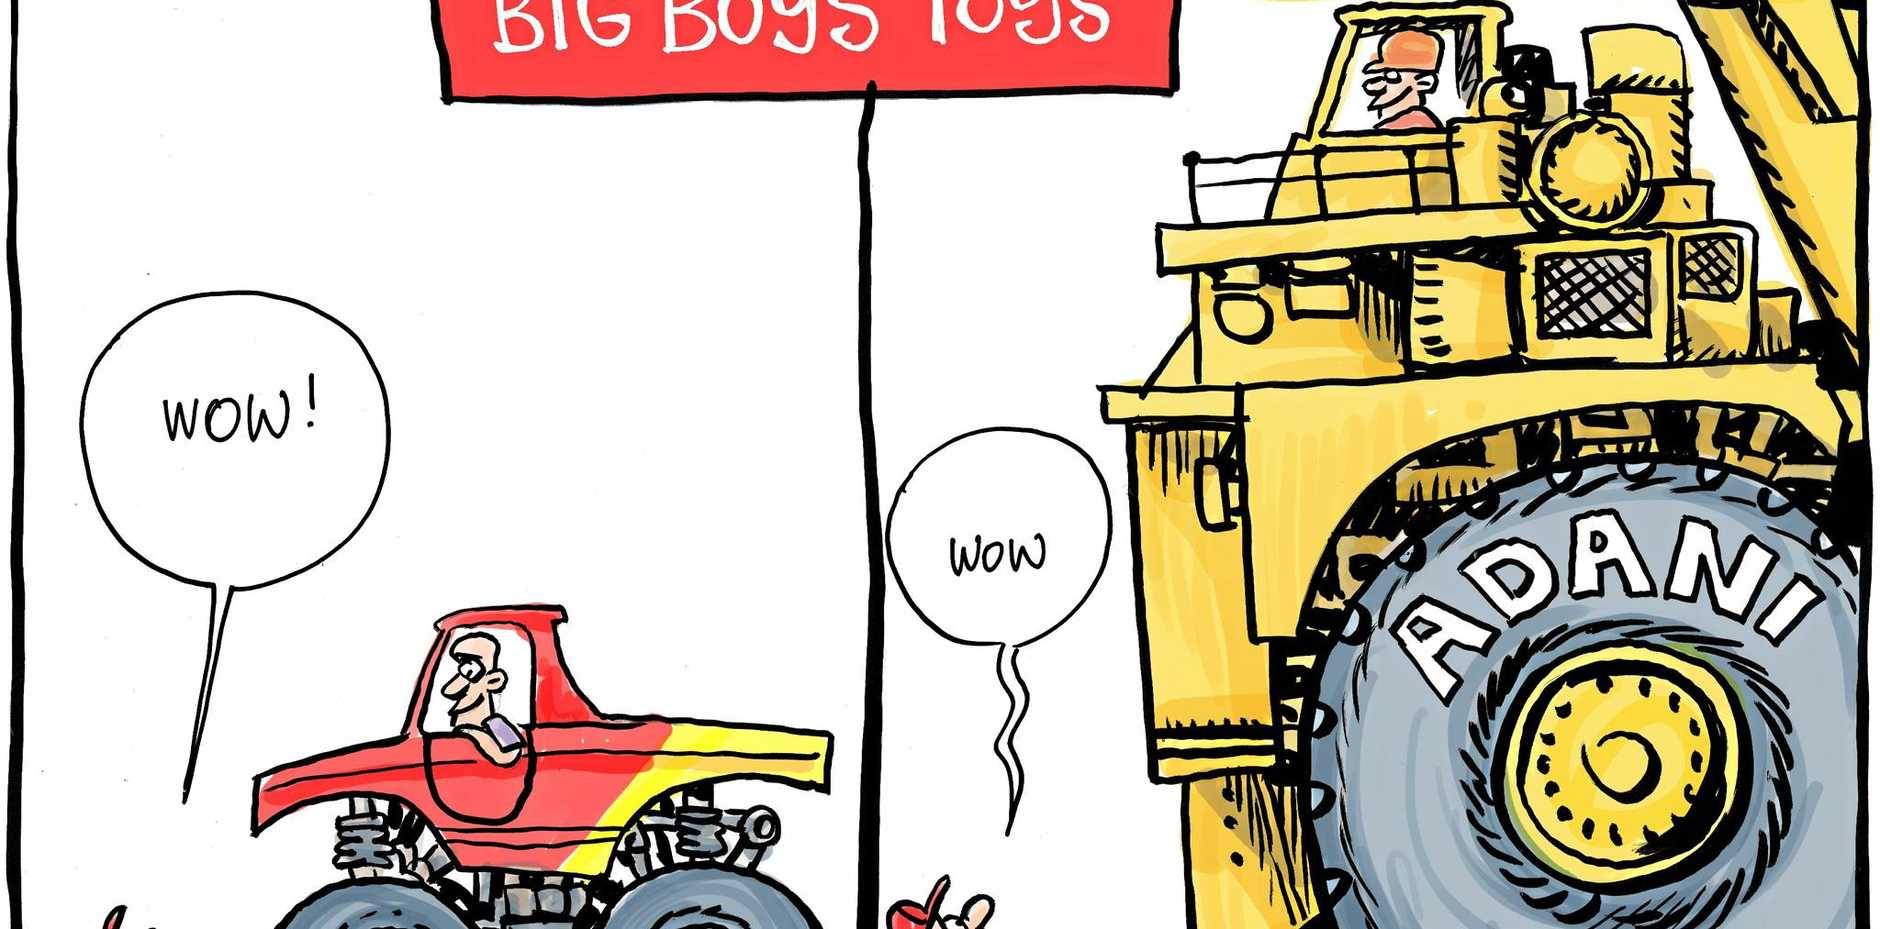 harry bruce cartoon big boys toys/adani